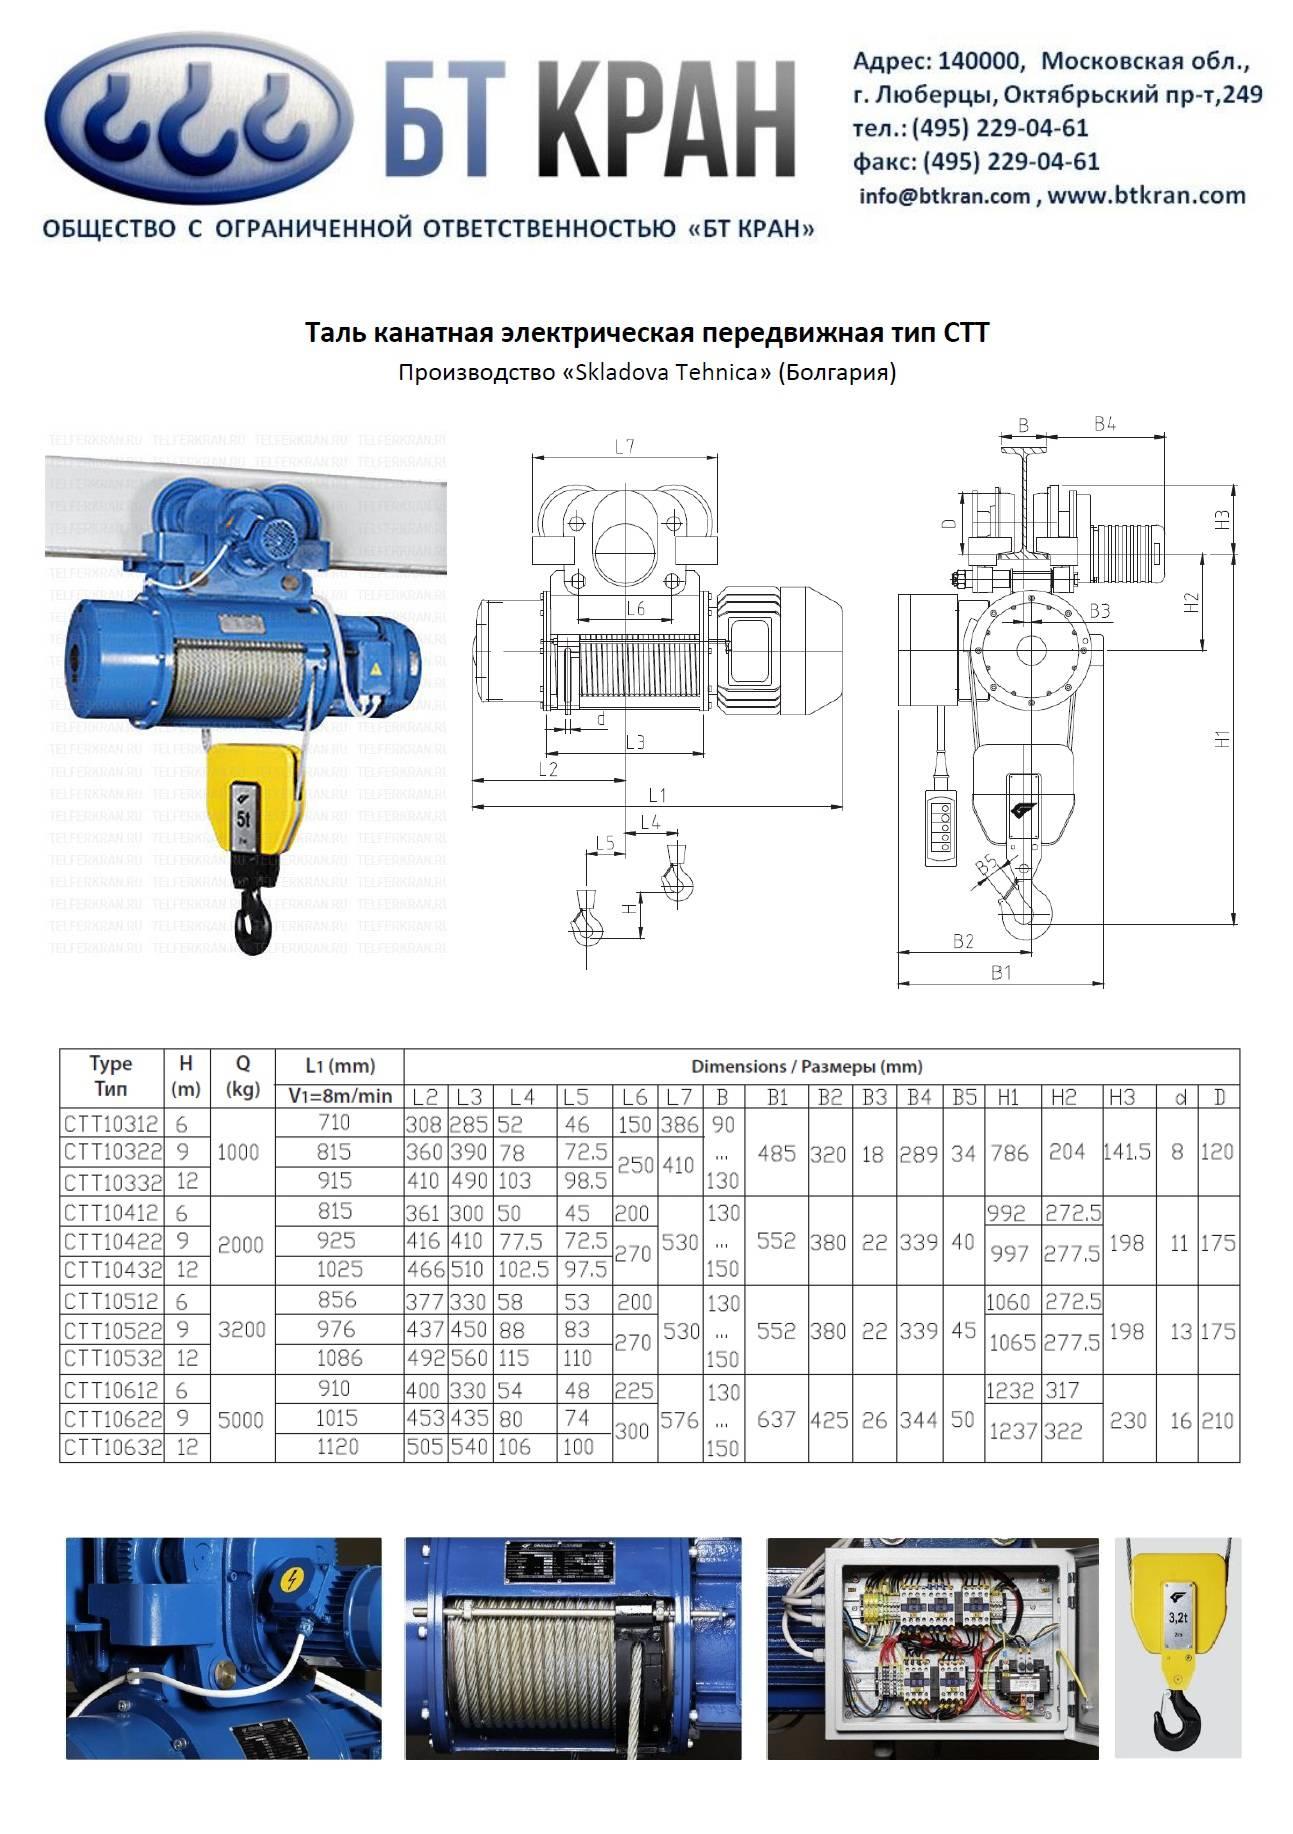 Электротали серии СТТ (габаритный чертеж)